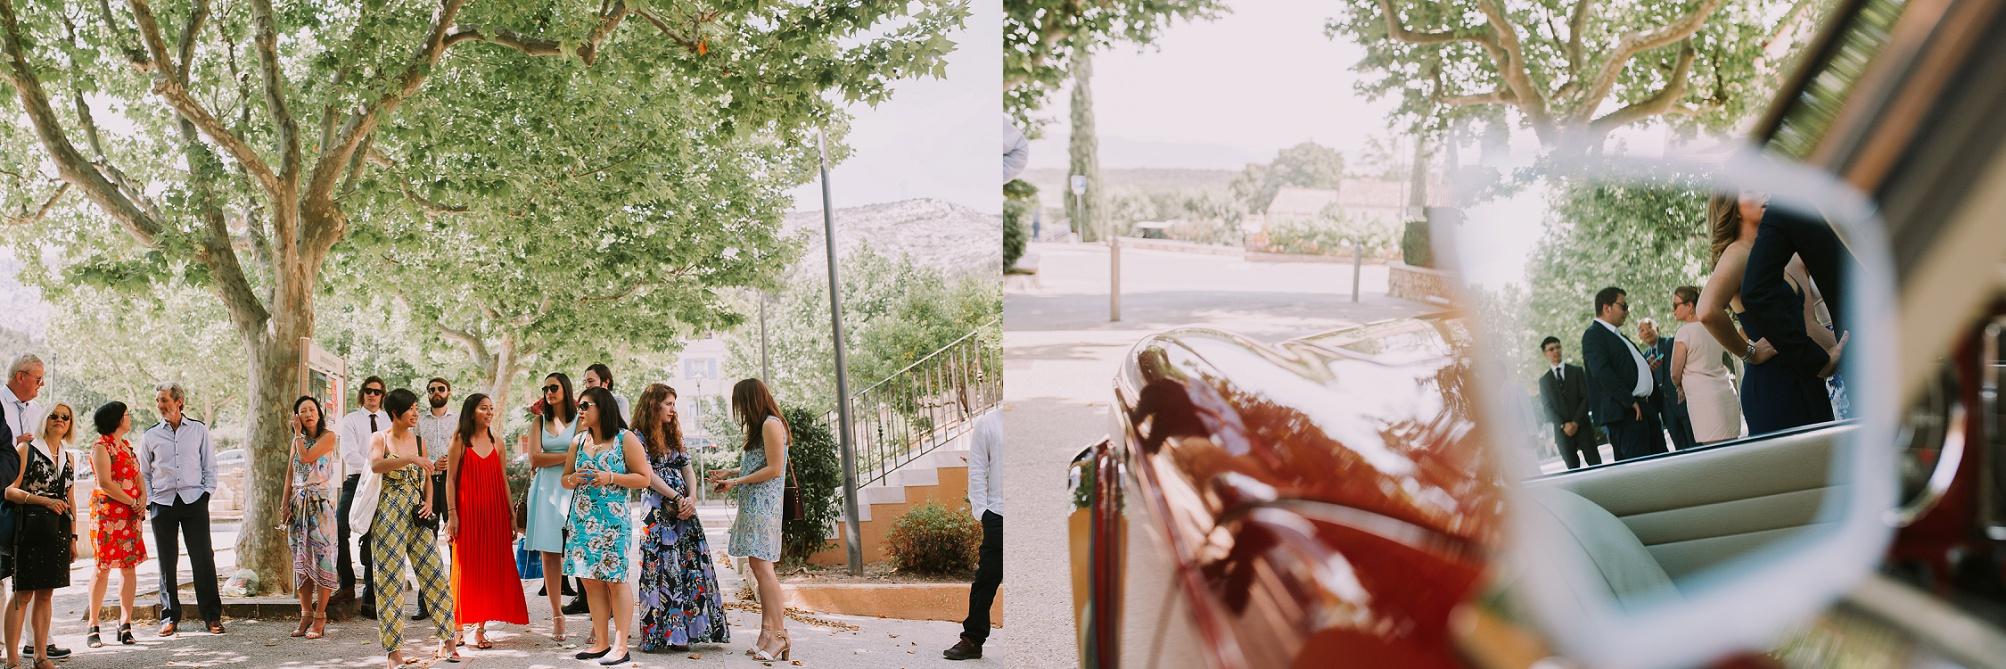 katerynaphotos-mariage-photographe-puyloubier-provence-aix-en-provence-sud-de-la-france_0347.jpg